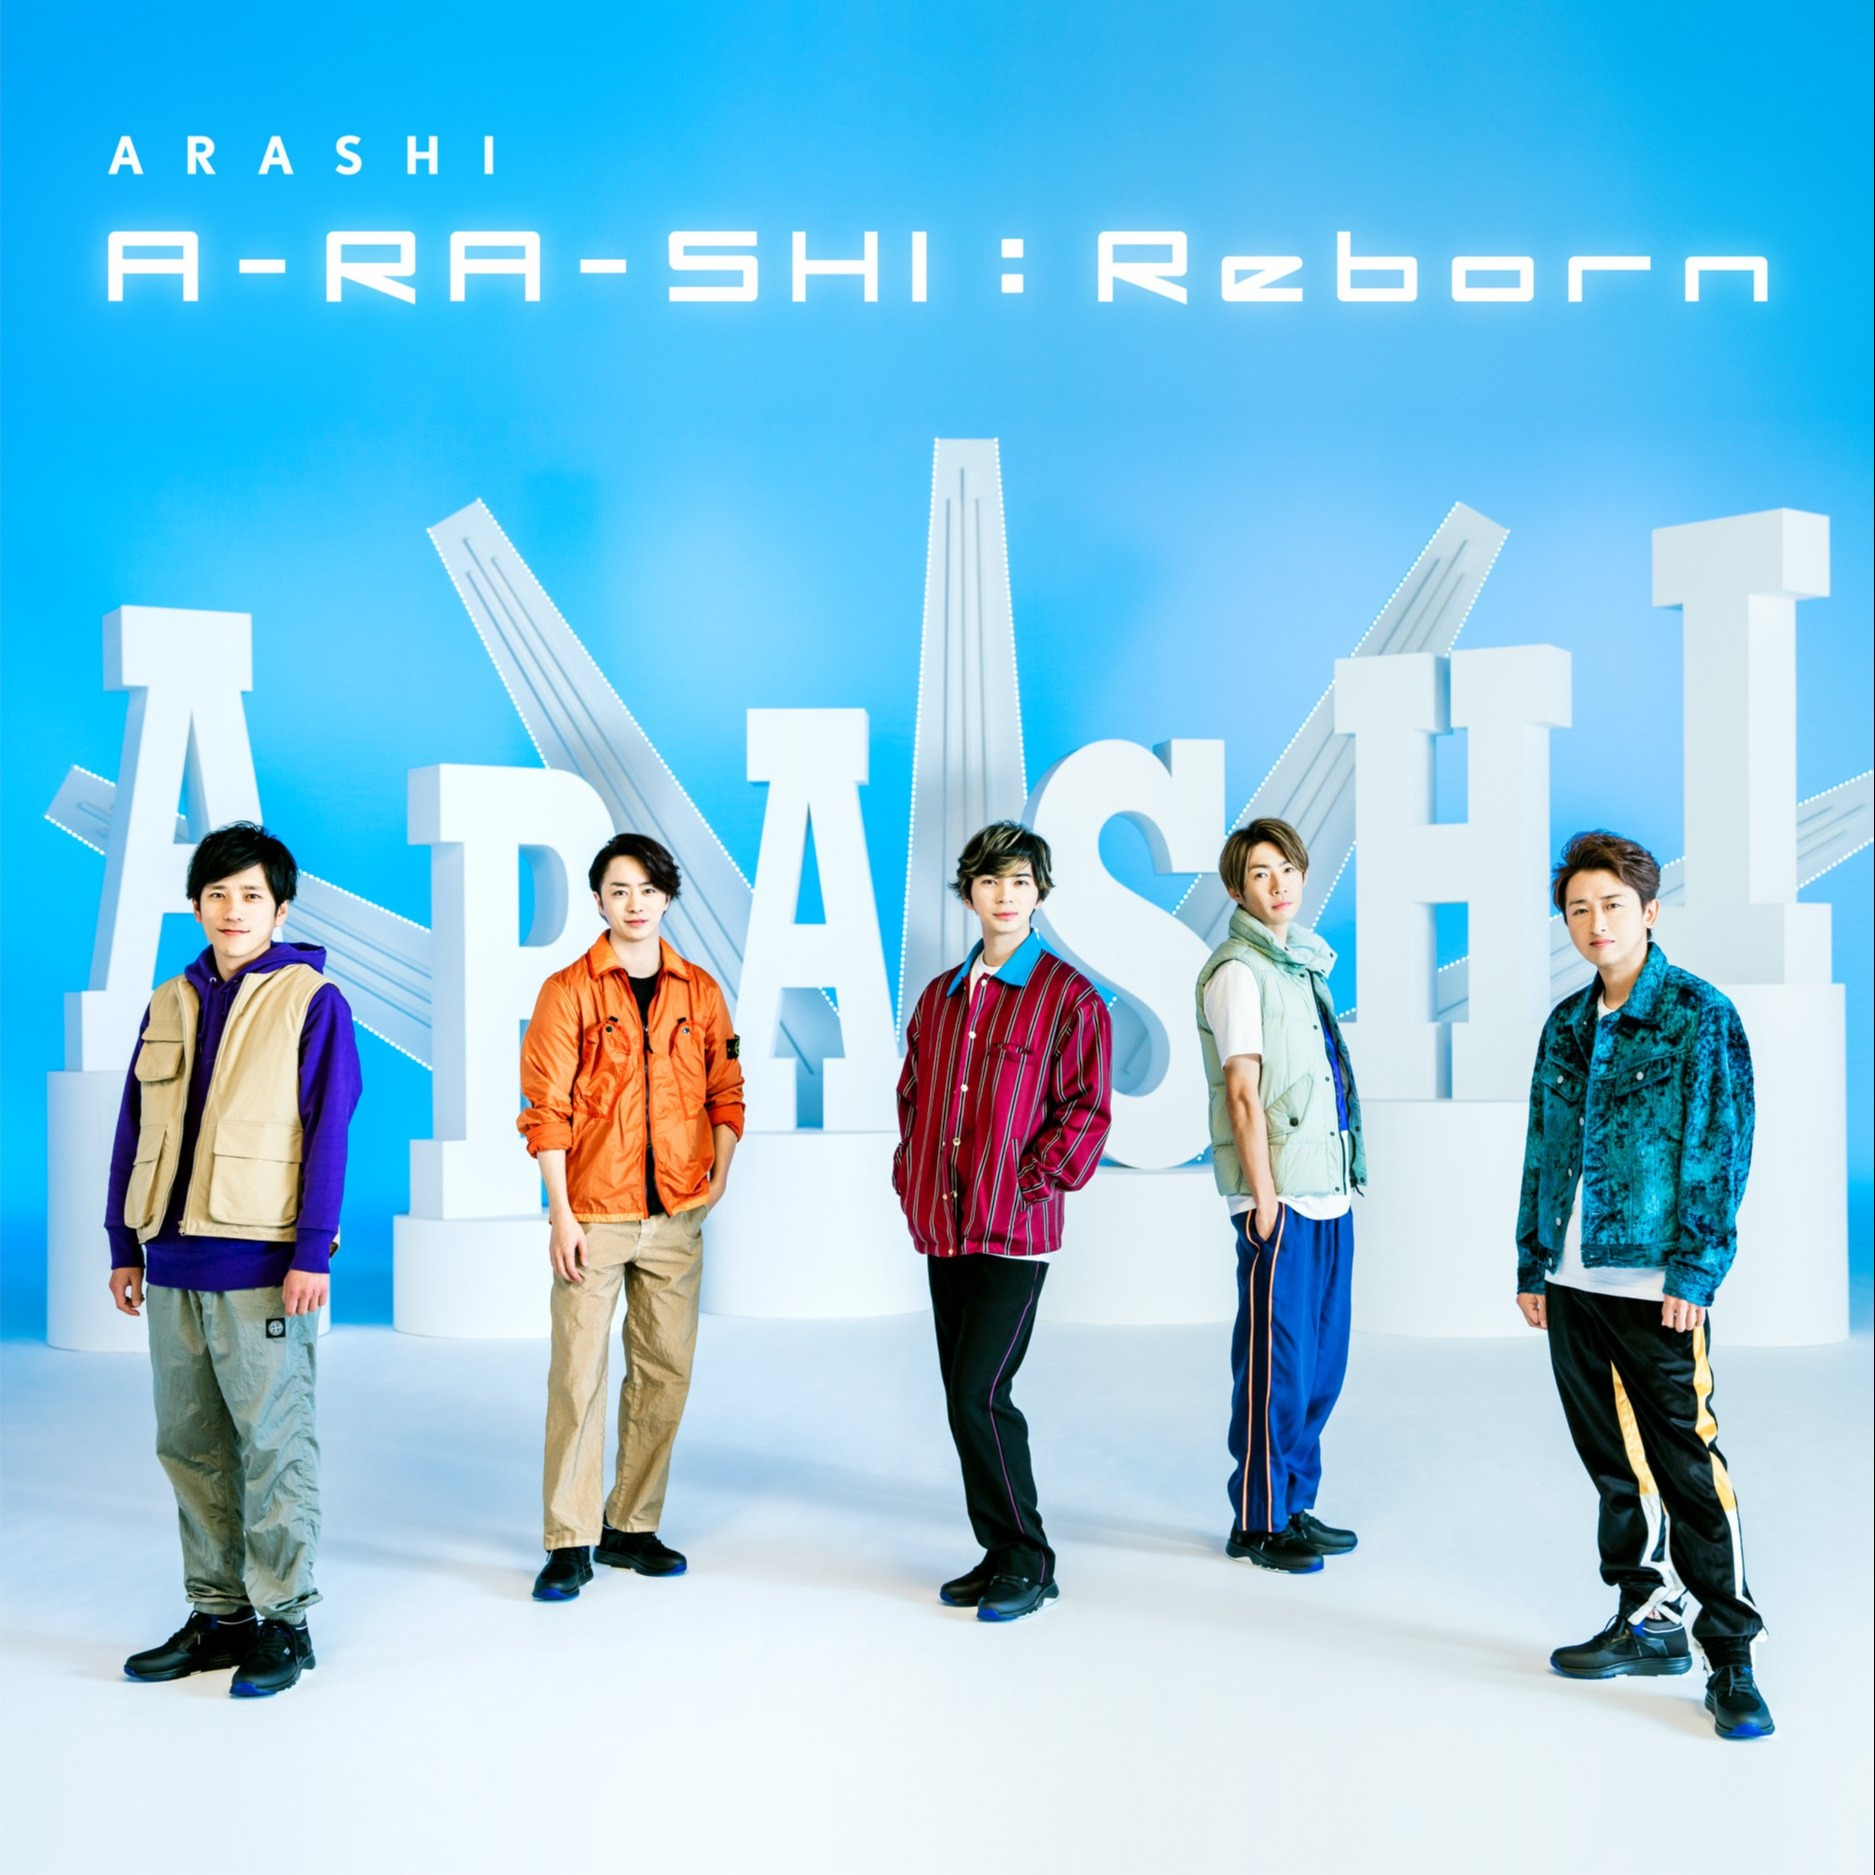 Watch the A-RA-SHI: Reborn music video